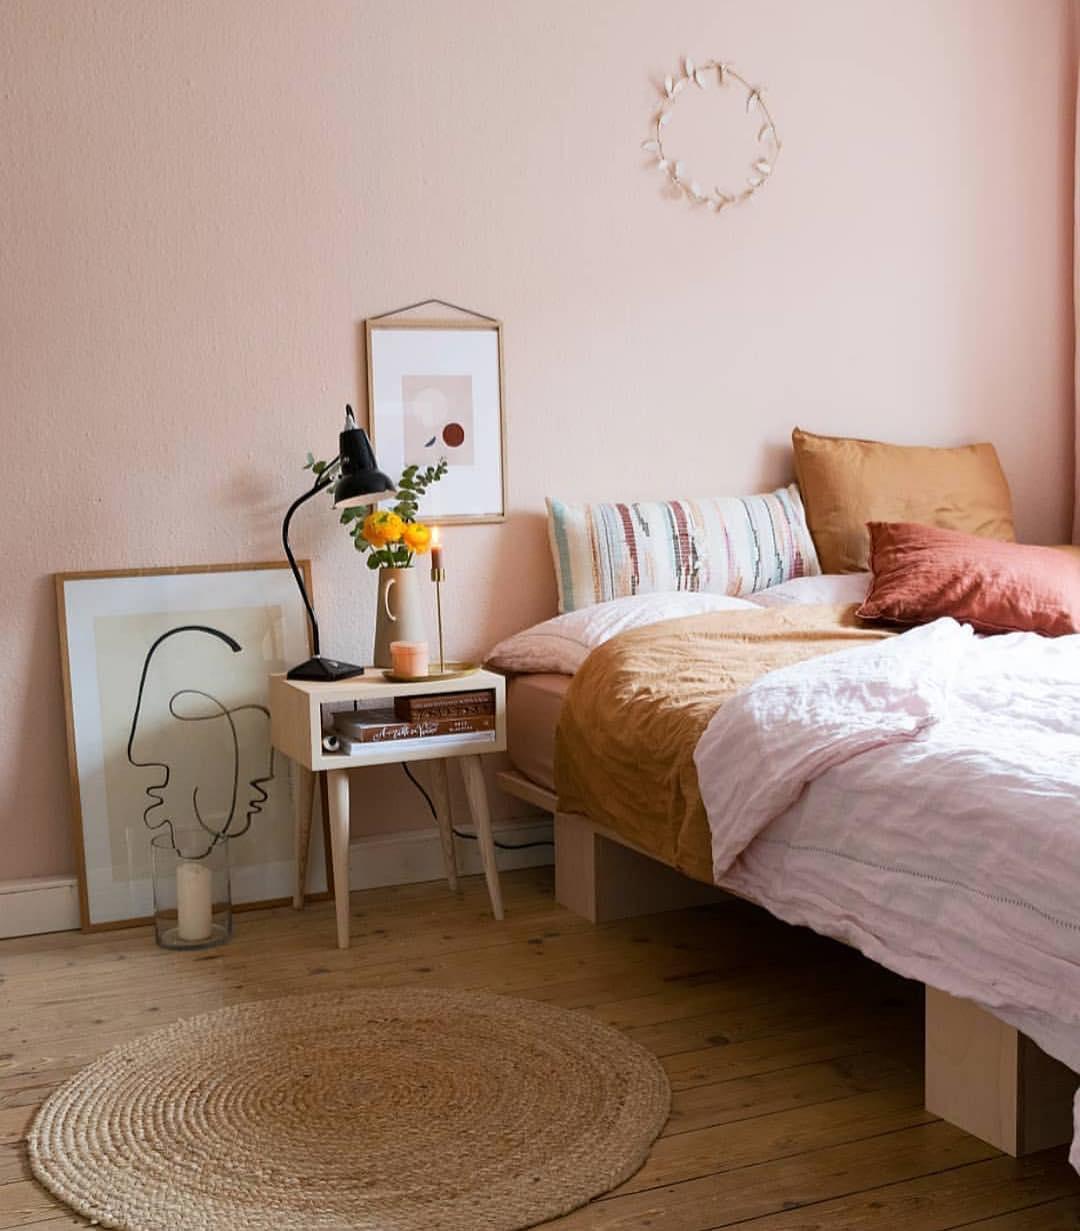 Bedroom decor; cozy bed room decor apartment; modern bed room decor ideas on a budget; bed room decor ideas rustic #bedroomdecor